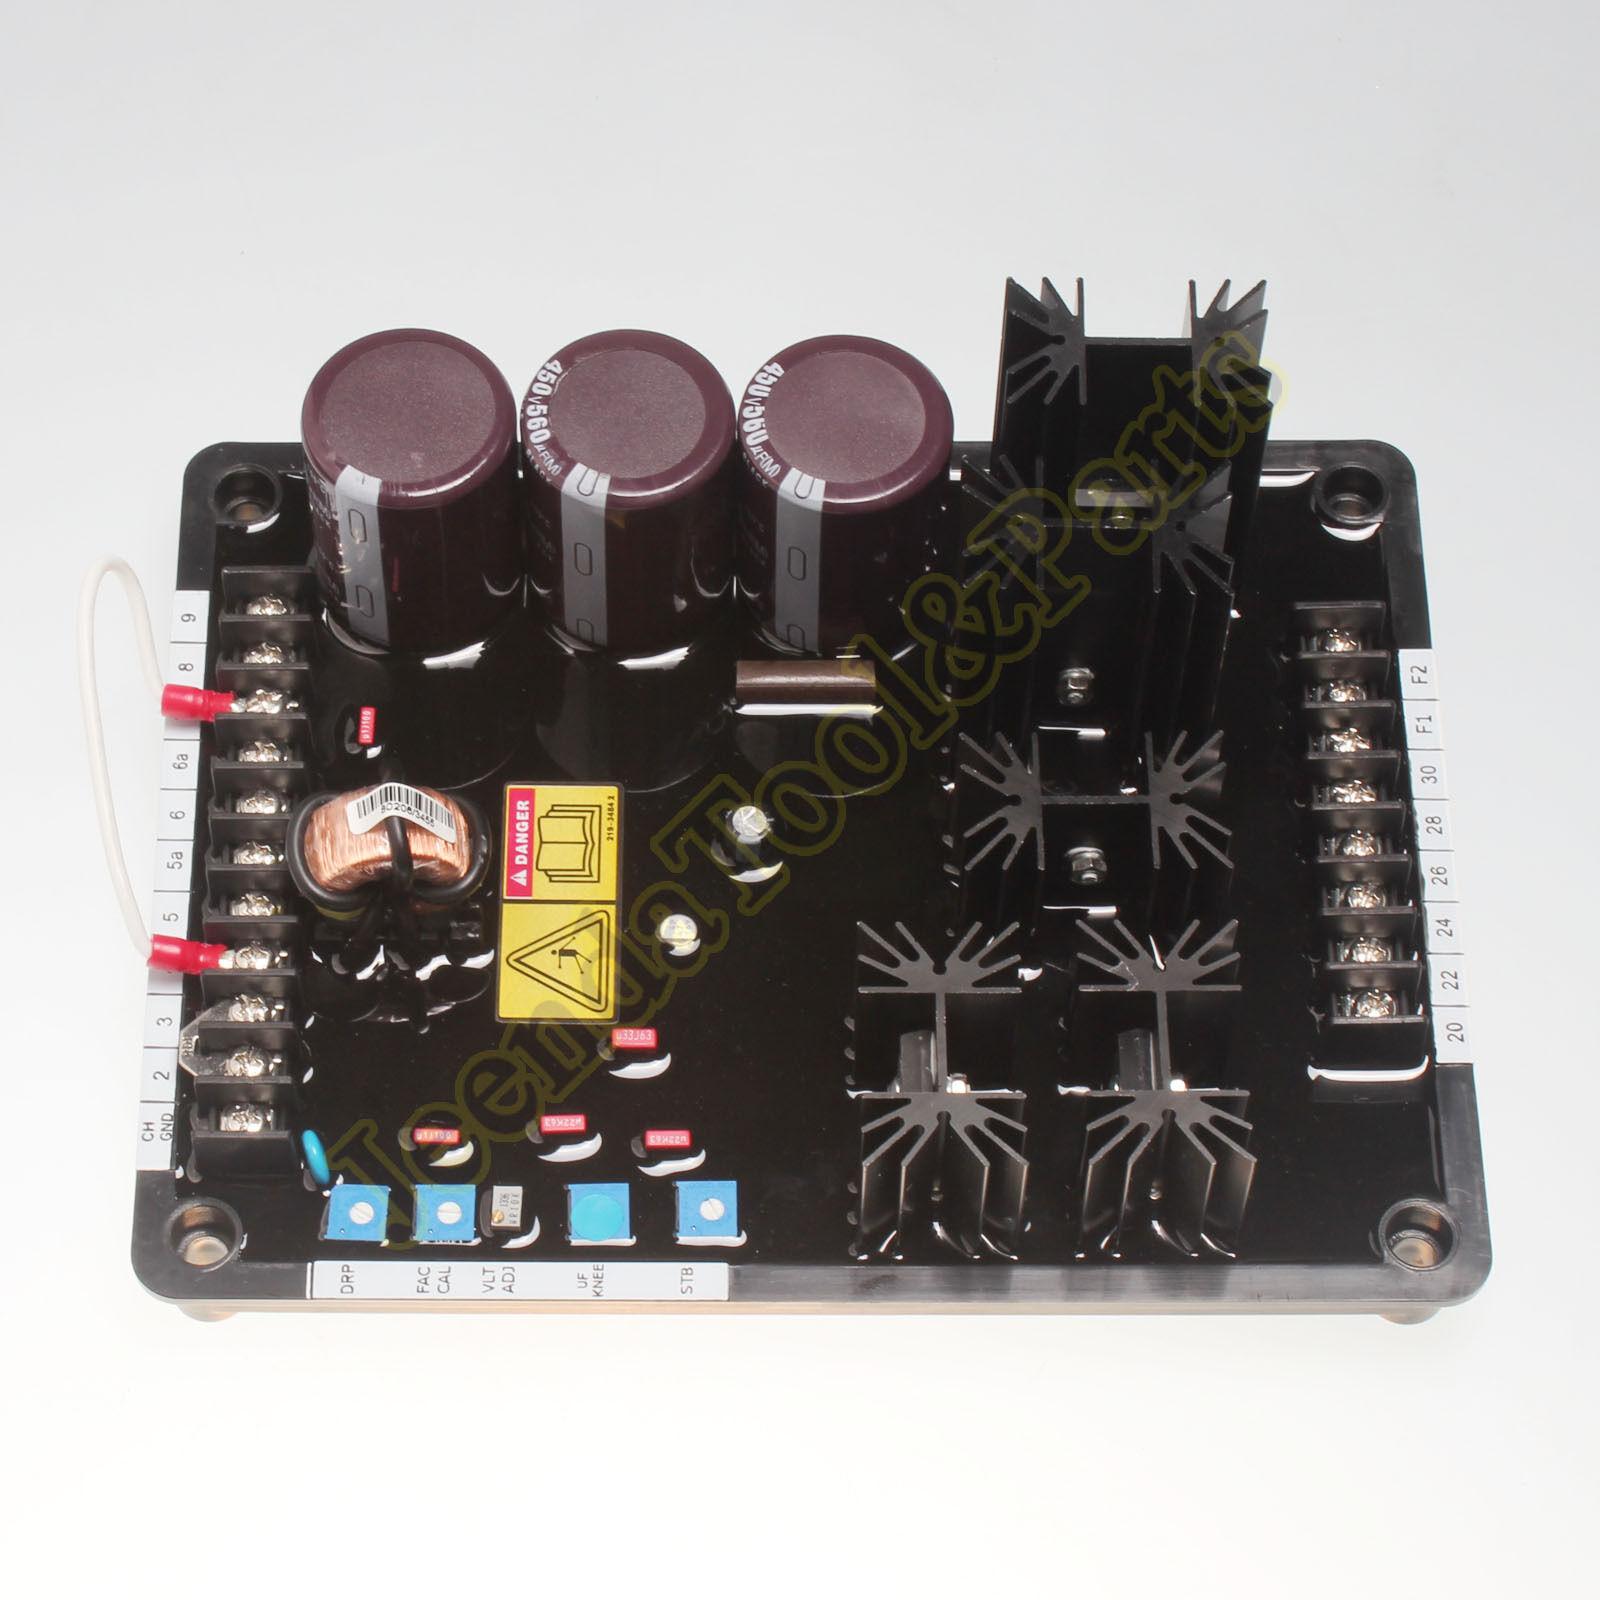 Regulator AVR 202 8634 for Caterpillar Diesel Generator Leroy